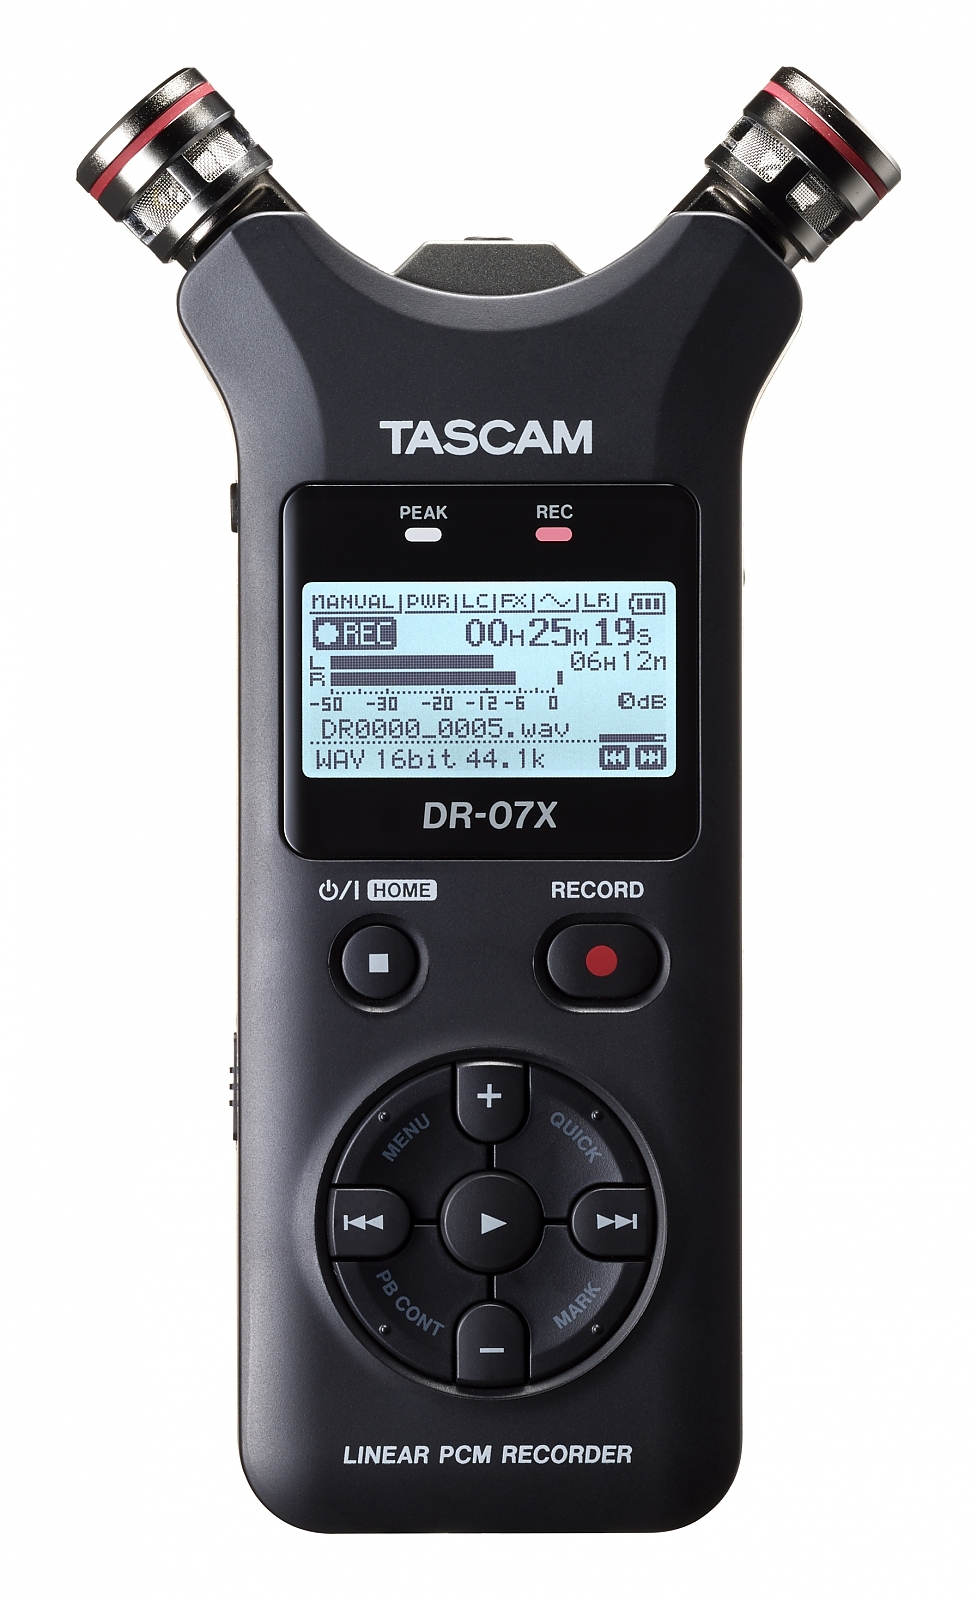 TASCAM DR-07X kompaktní ruční rekordér, 2 mikrofony (A/B,X/Y)